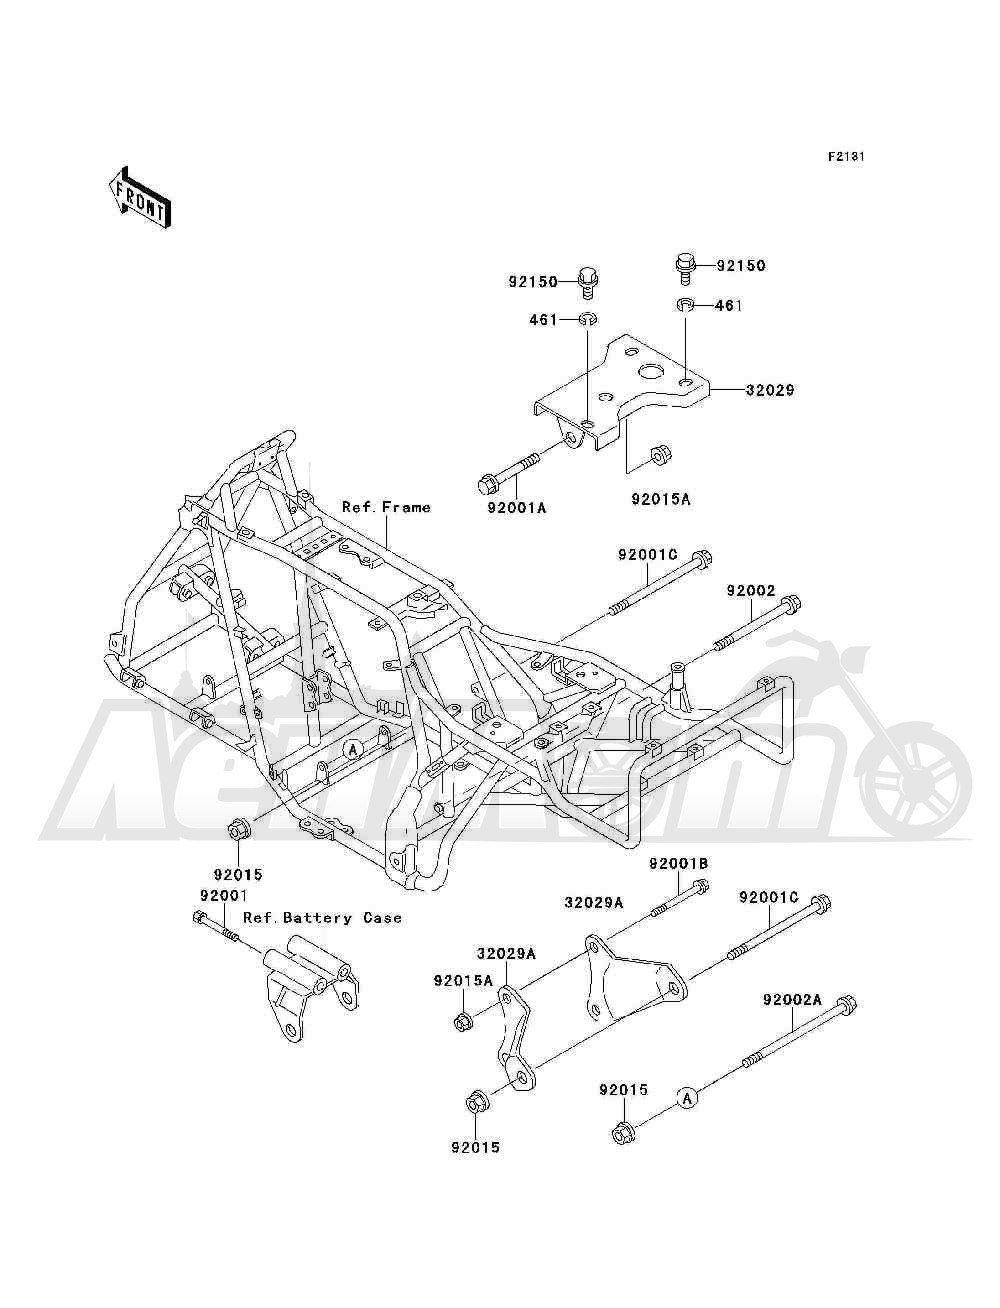 Запчасти для Квадроцикла Kawasaki 1993 BAYOU 300 4X4 (KLF300-C5) Раздел: FRAME FITTINGS | рама фитинги